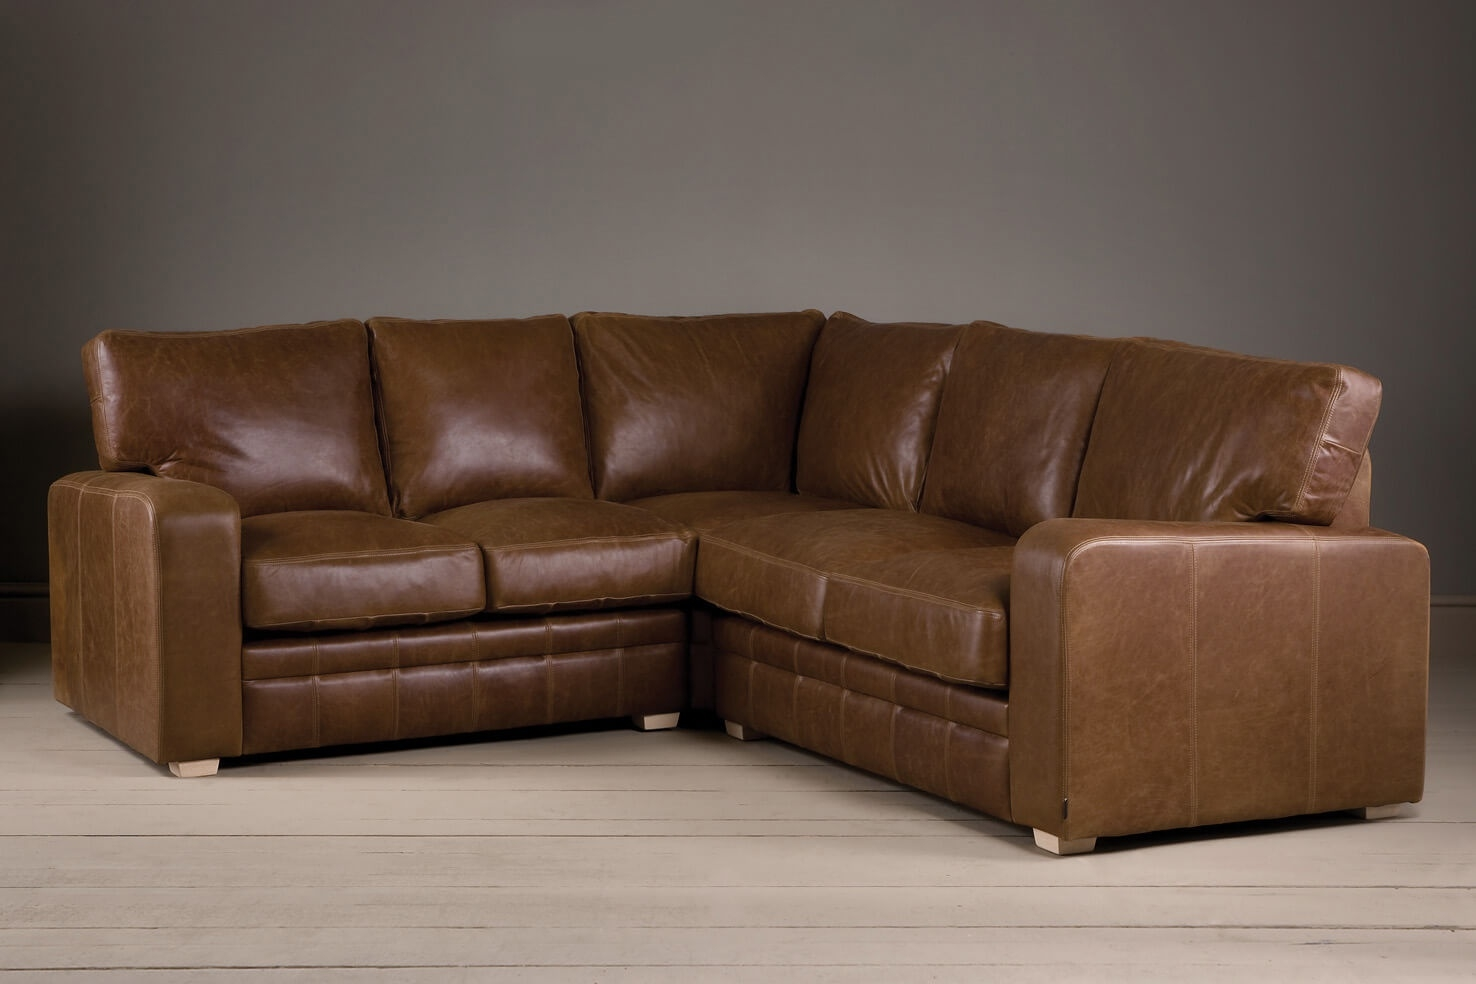 The Square Arm Leather Corner Sofa Indigo Furniture For Corner Sofa Leather (Image 13 of 15)